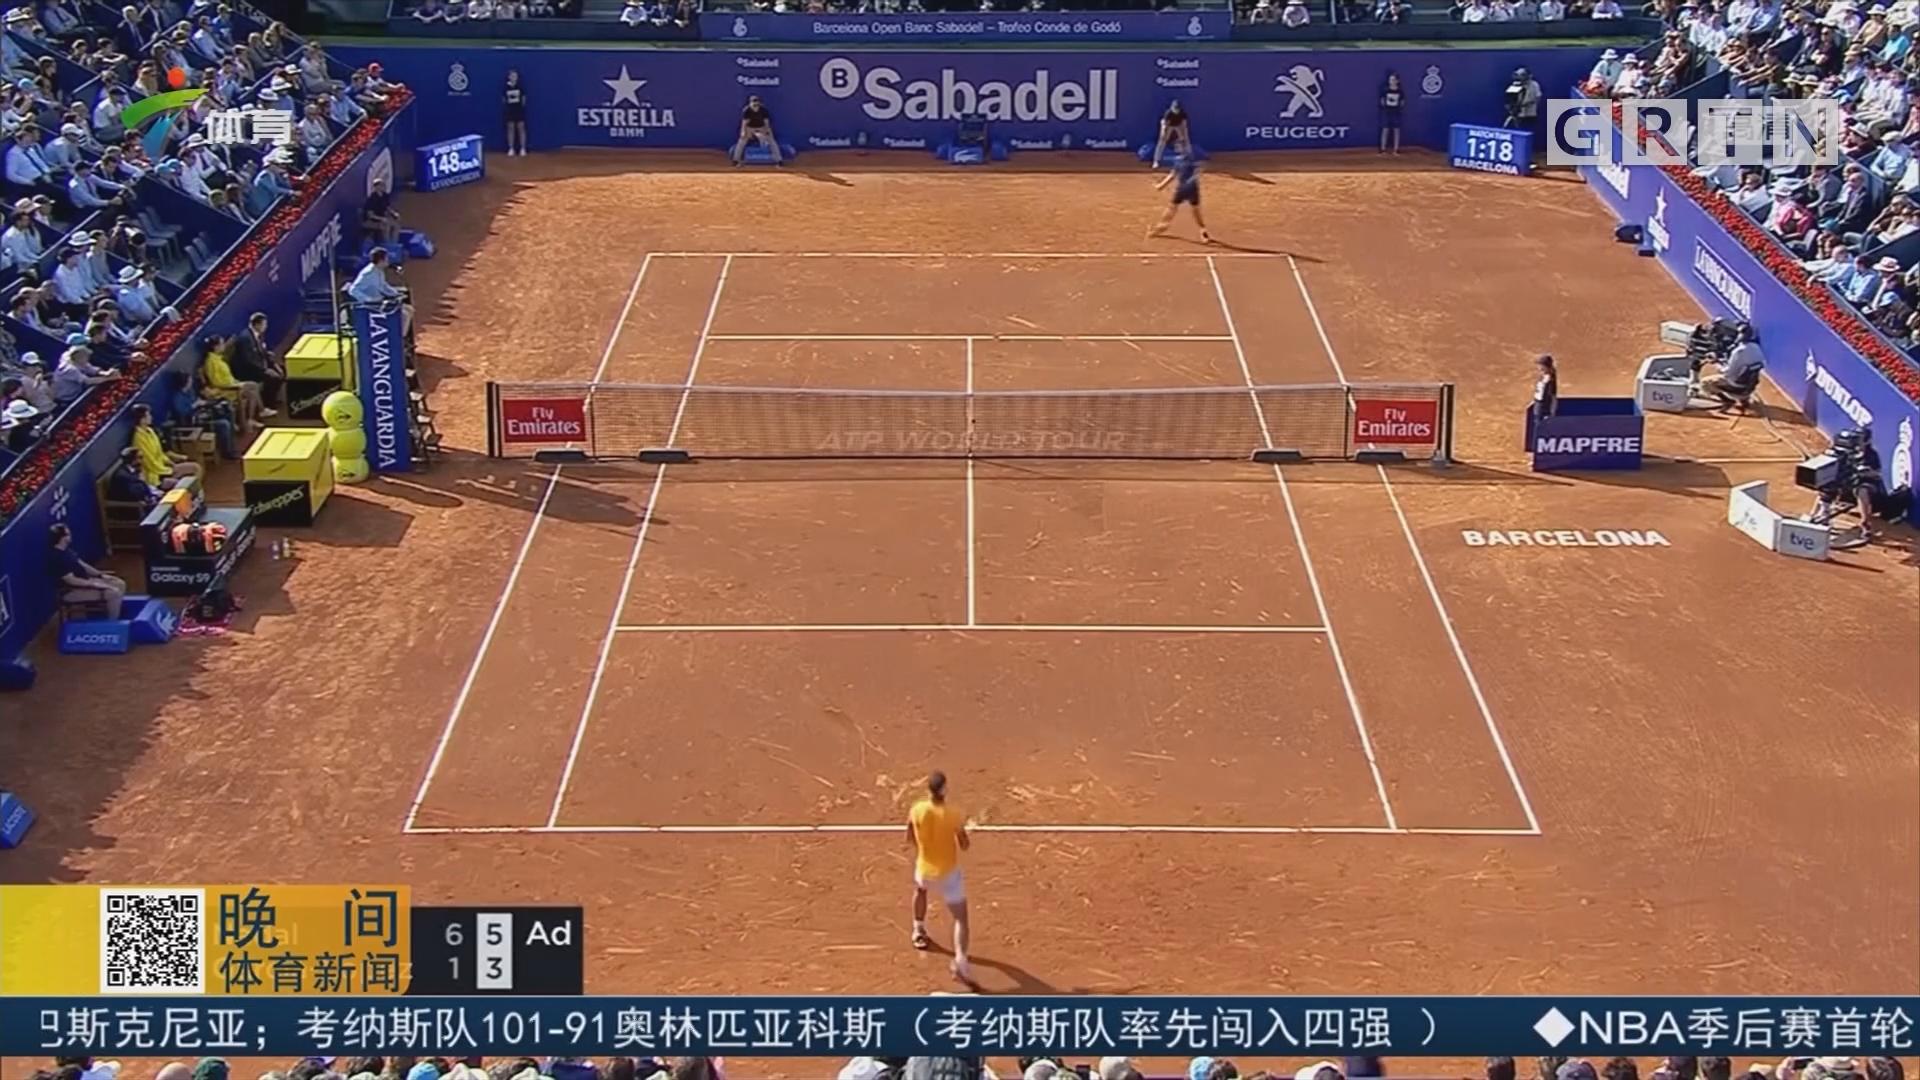 ATP巴塞罗那赛 纳达尔携迪米晋级八强